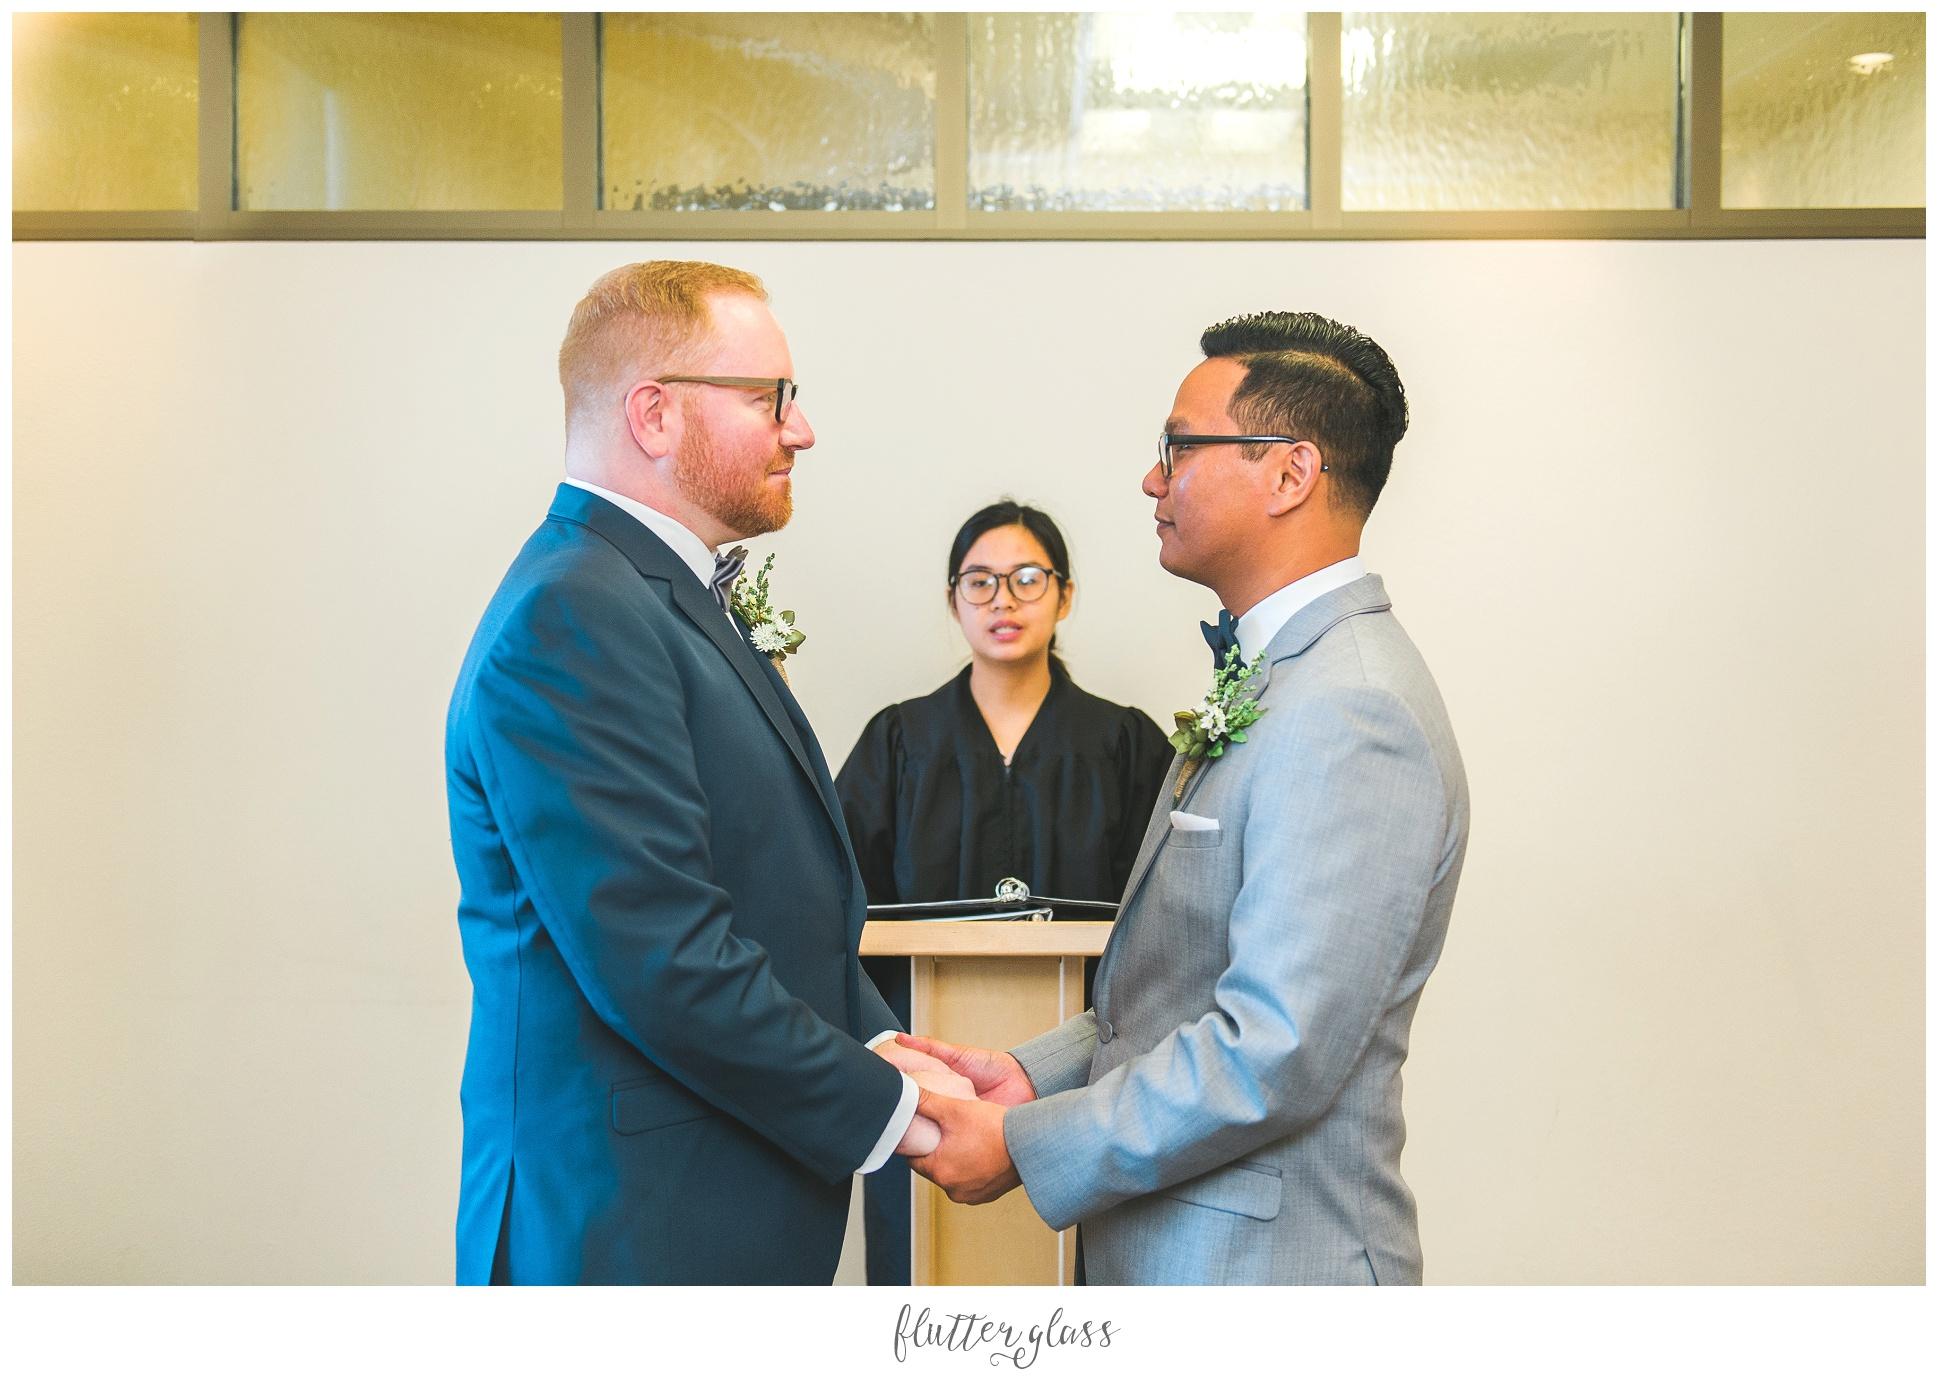 San Diego Courthouse Wedding LGBT_0001.jpg